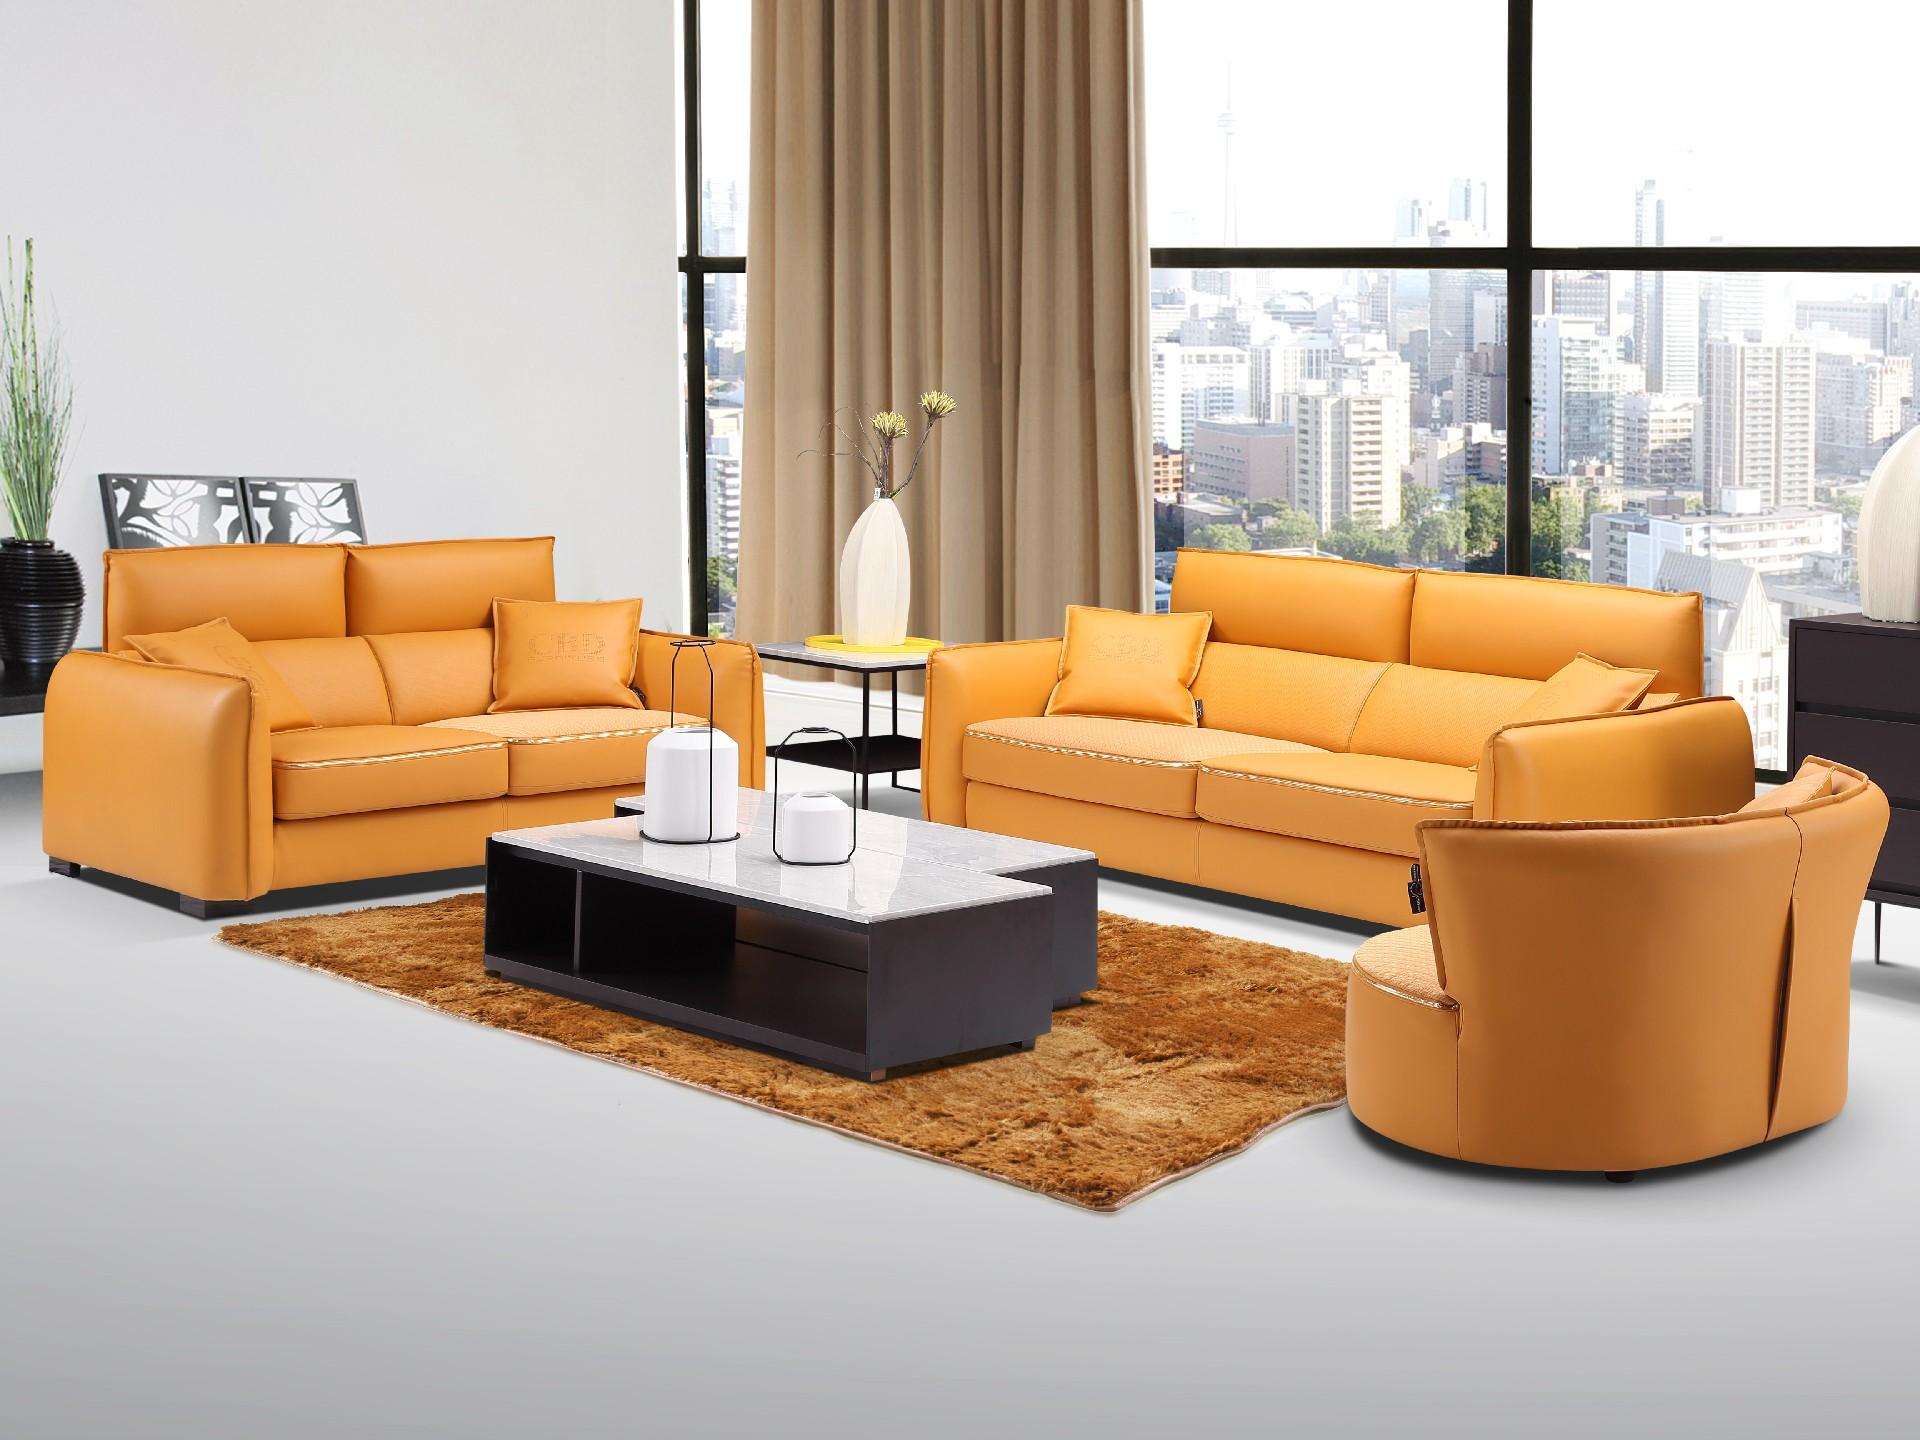 Charmant CBD Furniture